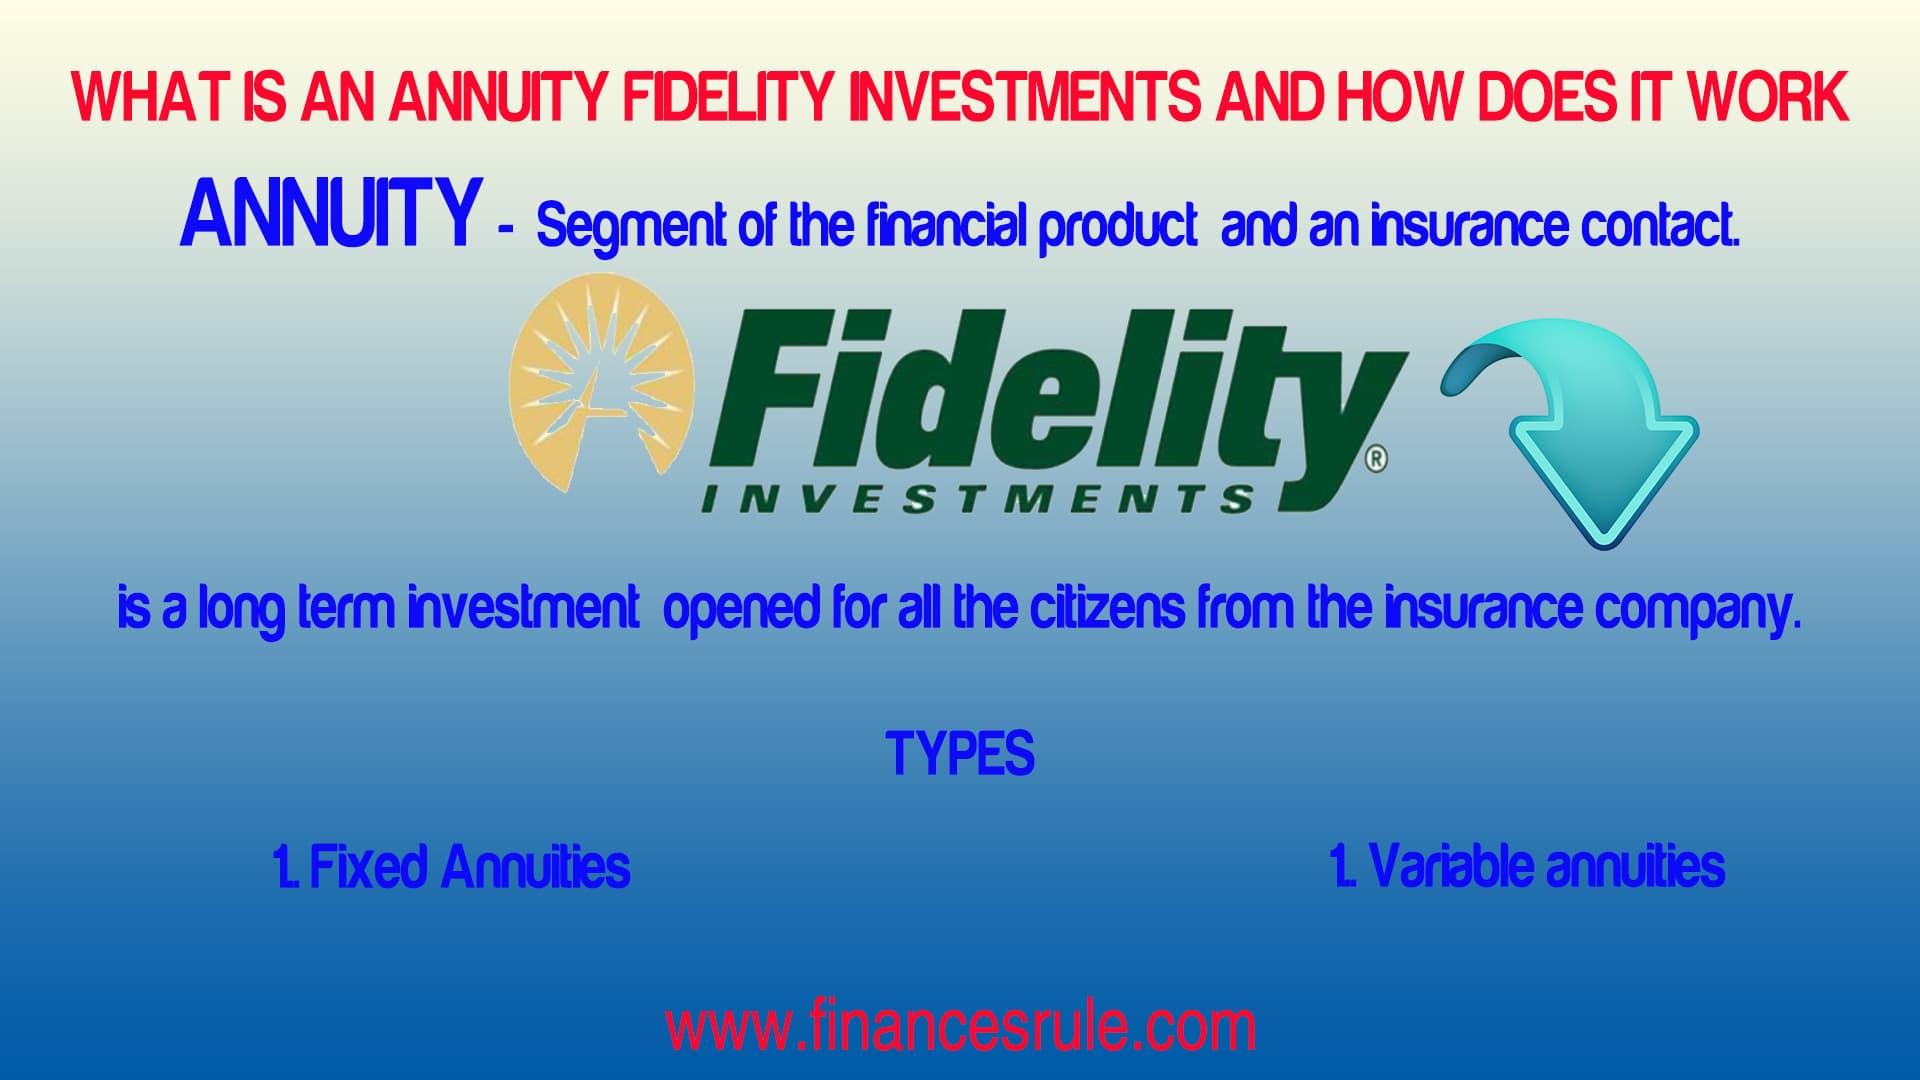 Fidelity Annuity